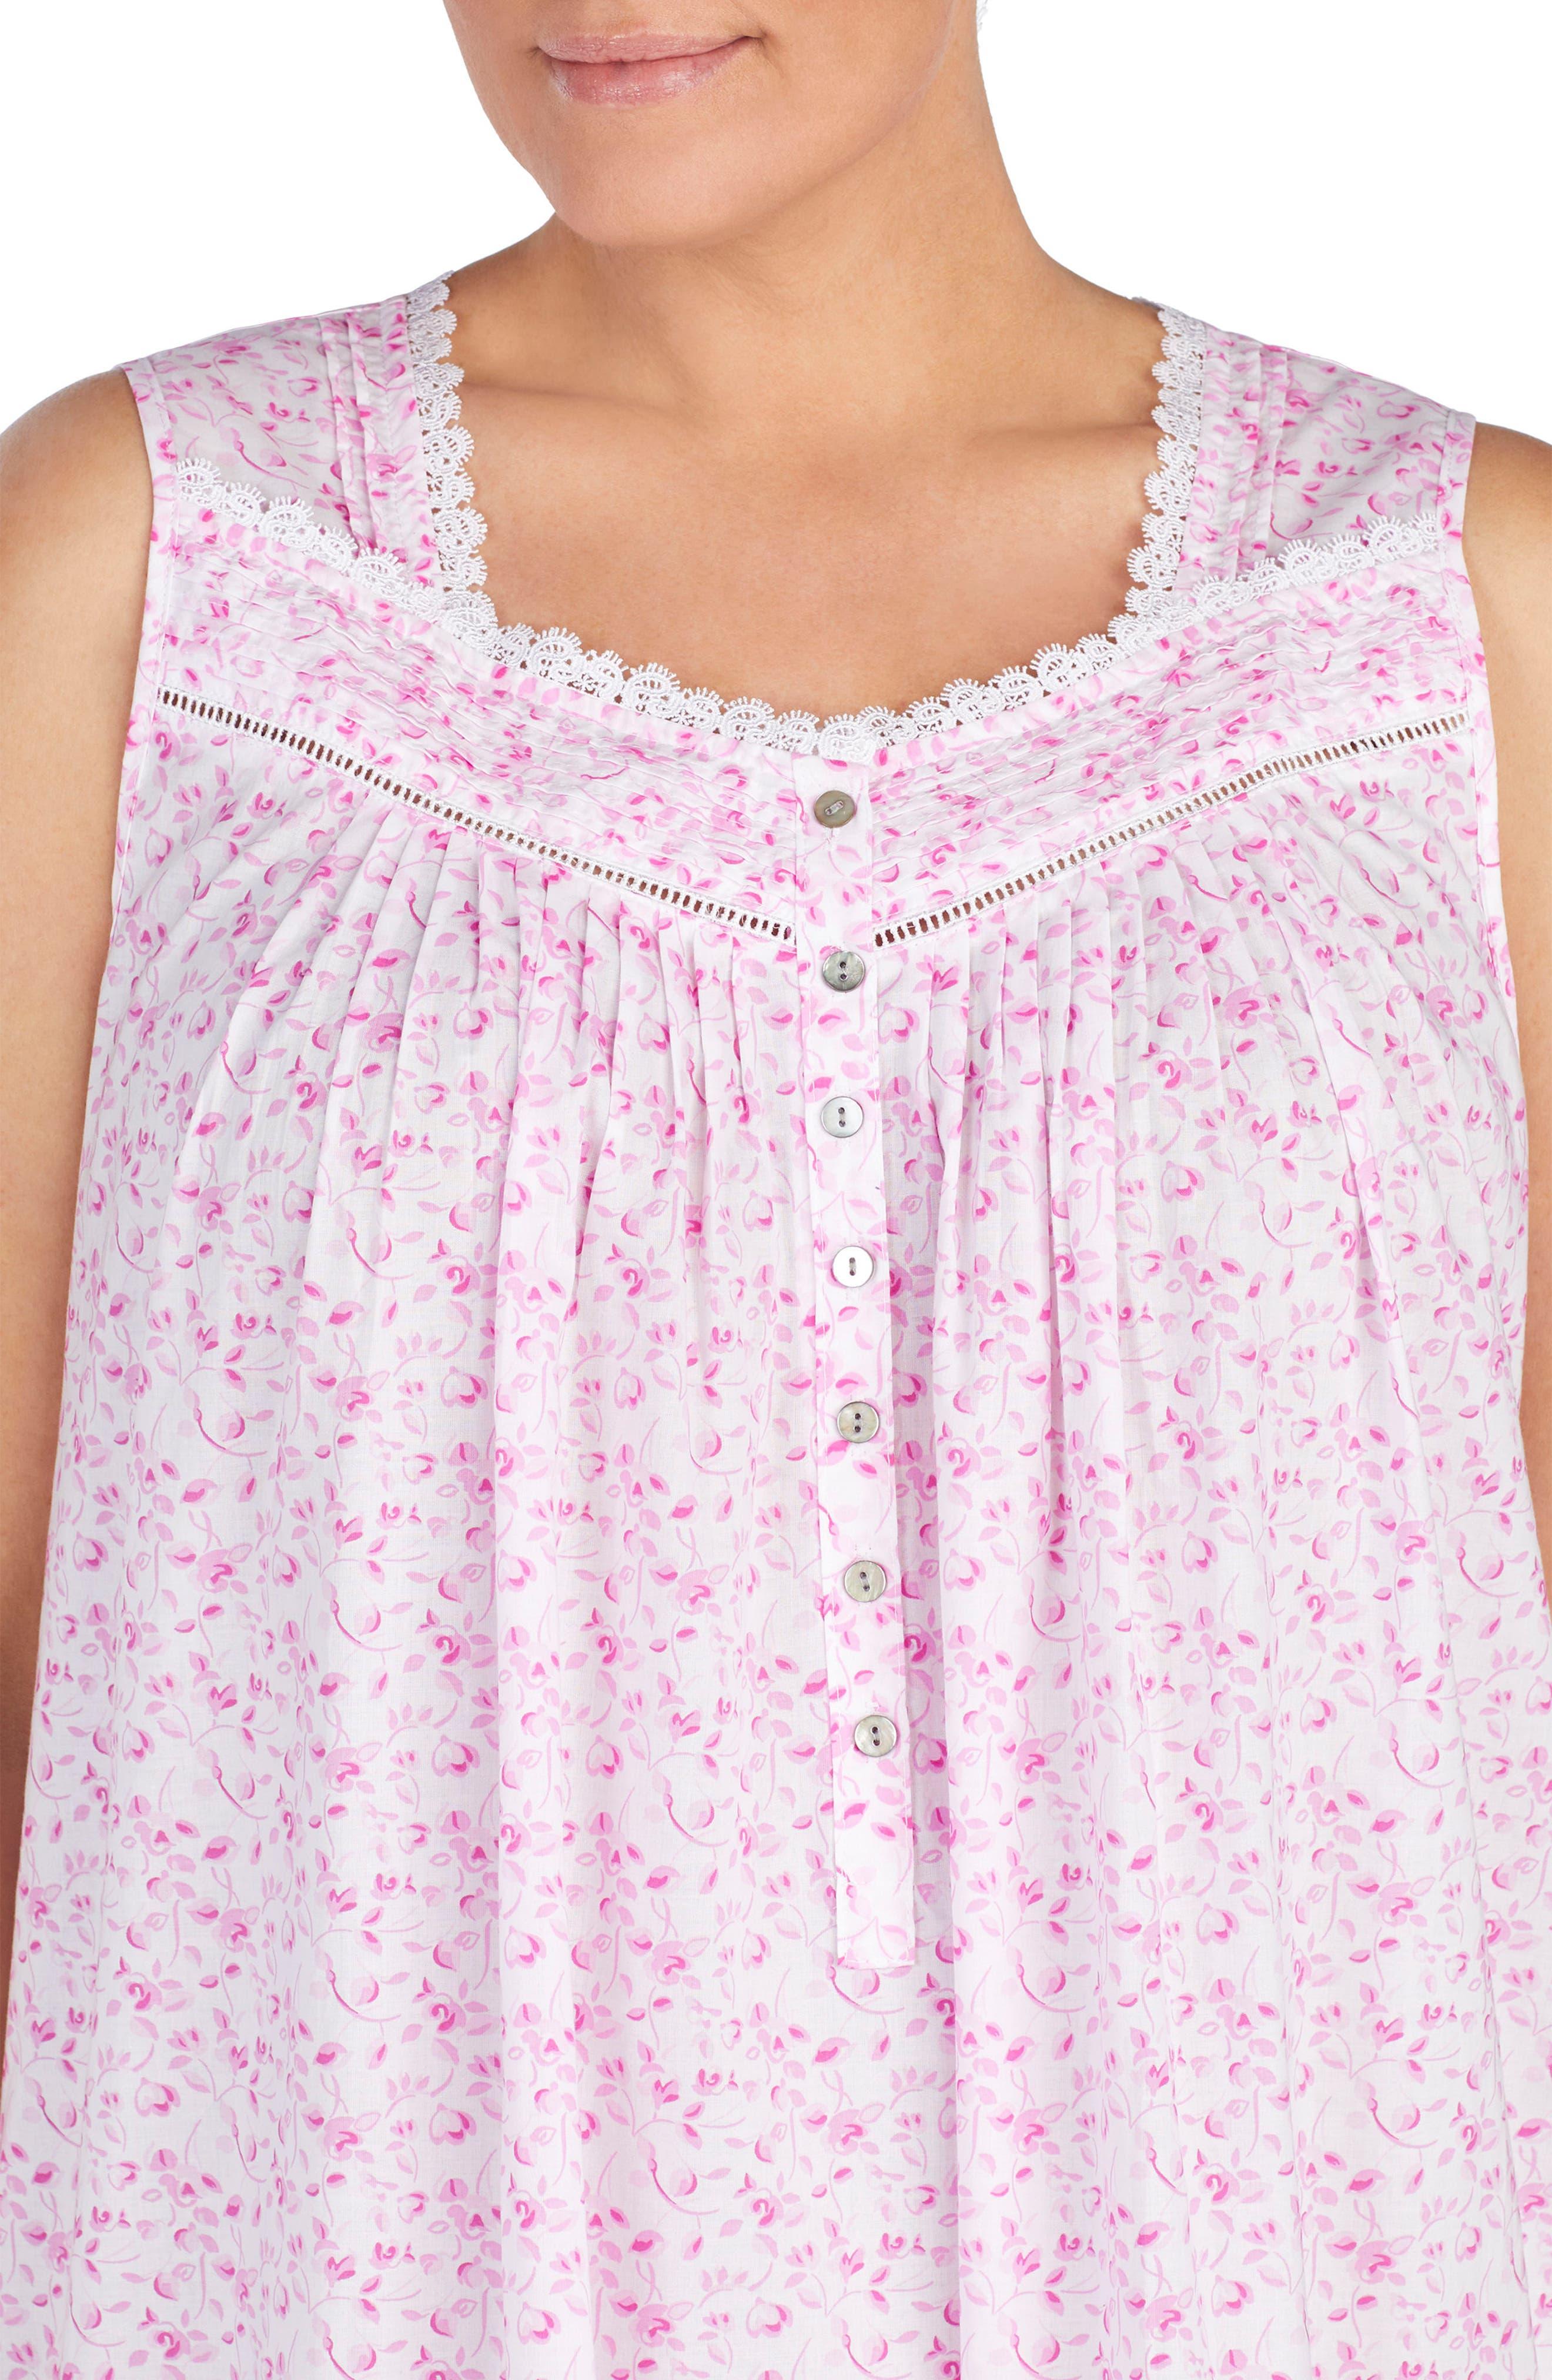 Cotton Lawn Ballet Nightgown,                             Alternate thumbnail 3, color,                             656